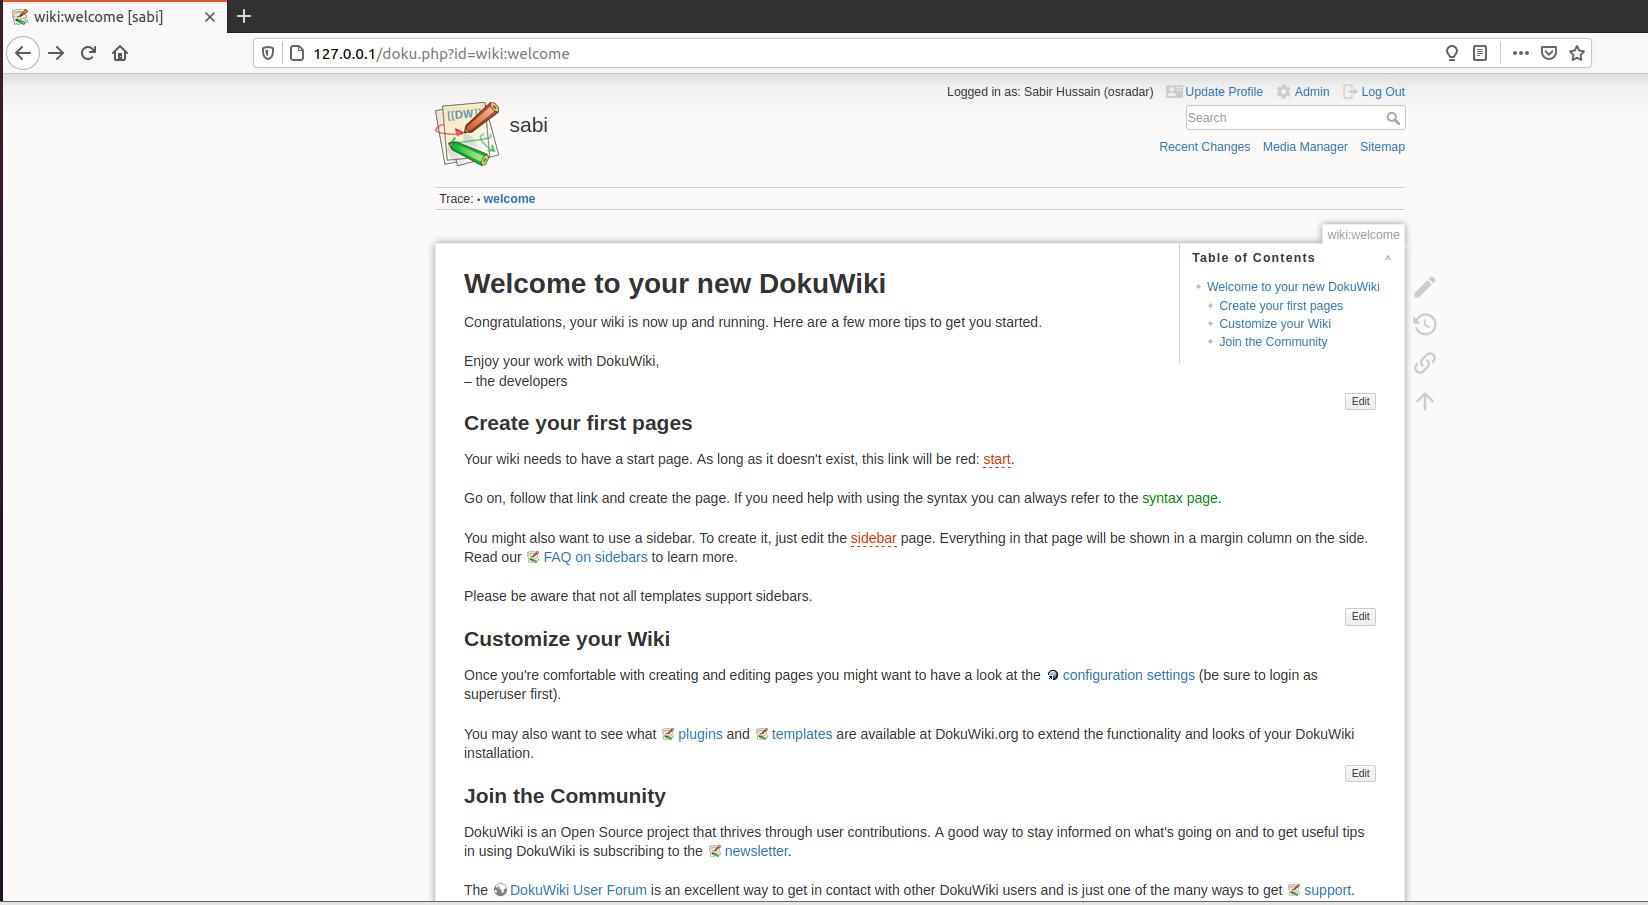 How To Install DokuWiki On Ubuntu 20.04